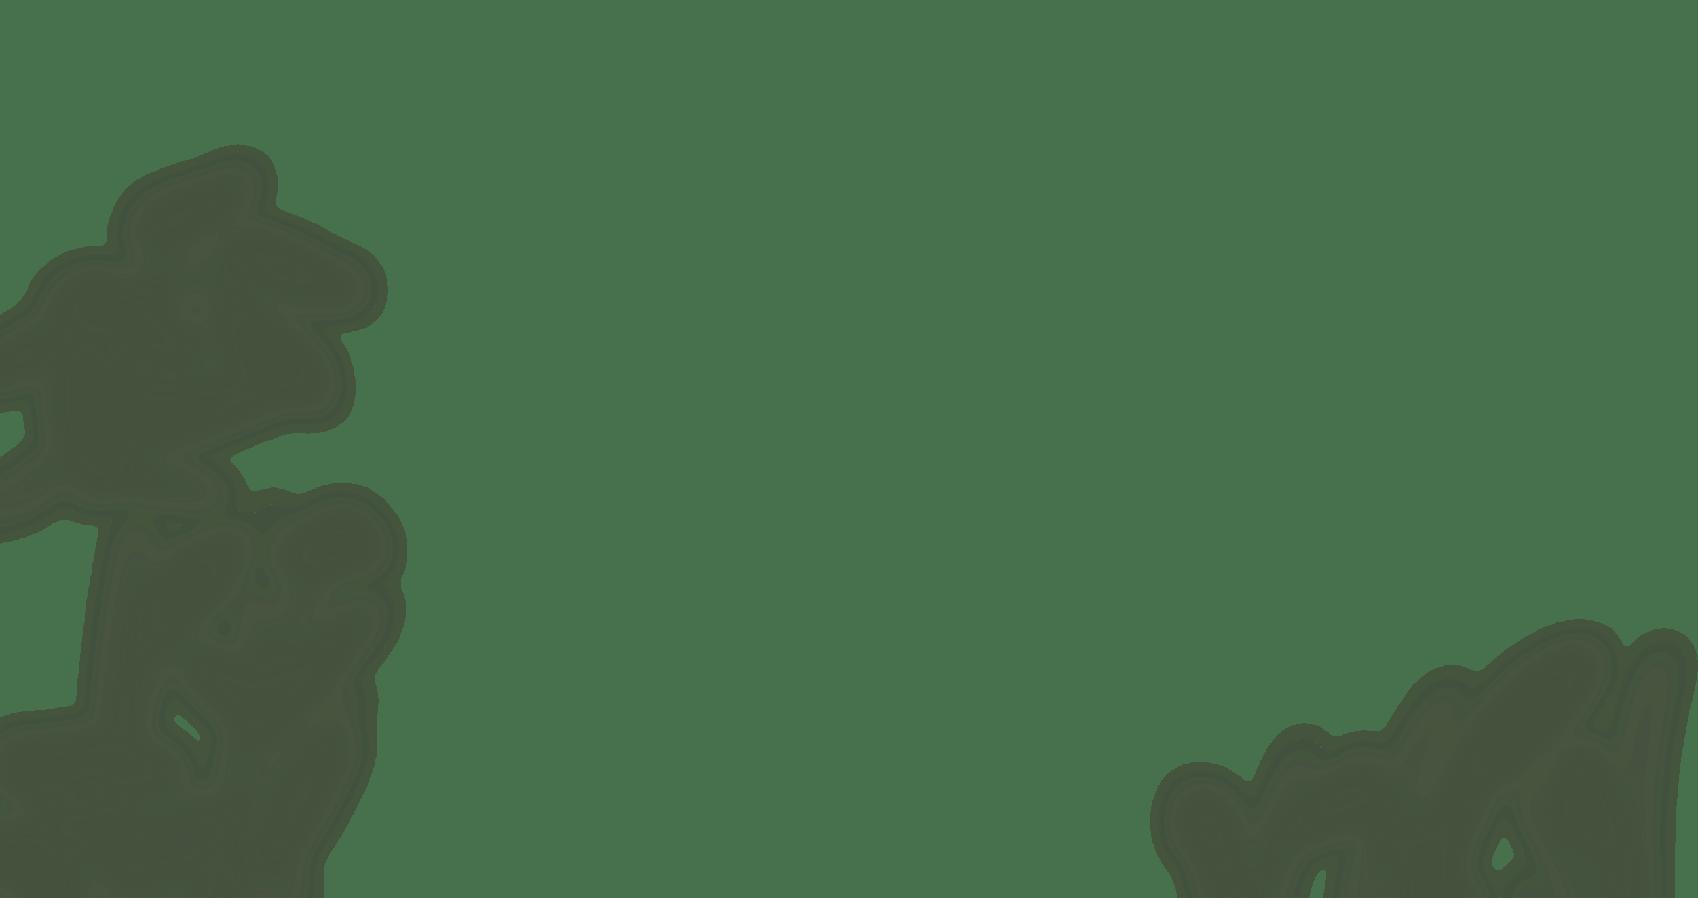 illustration of blurred background plants